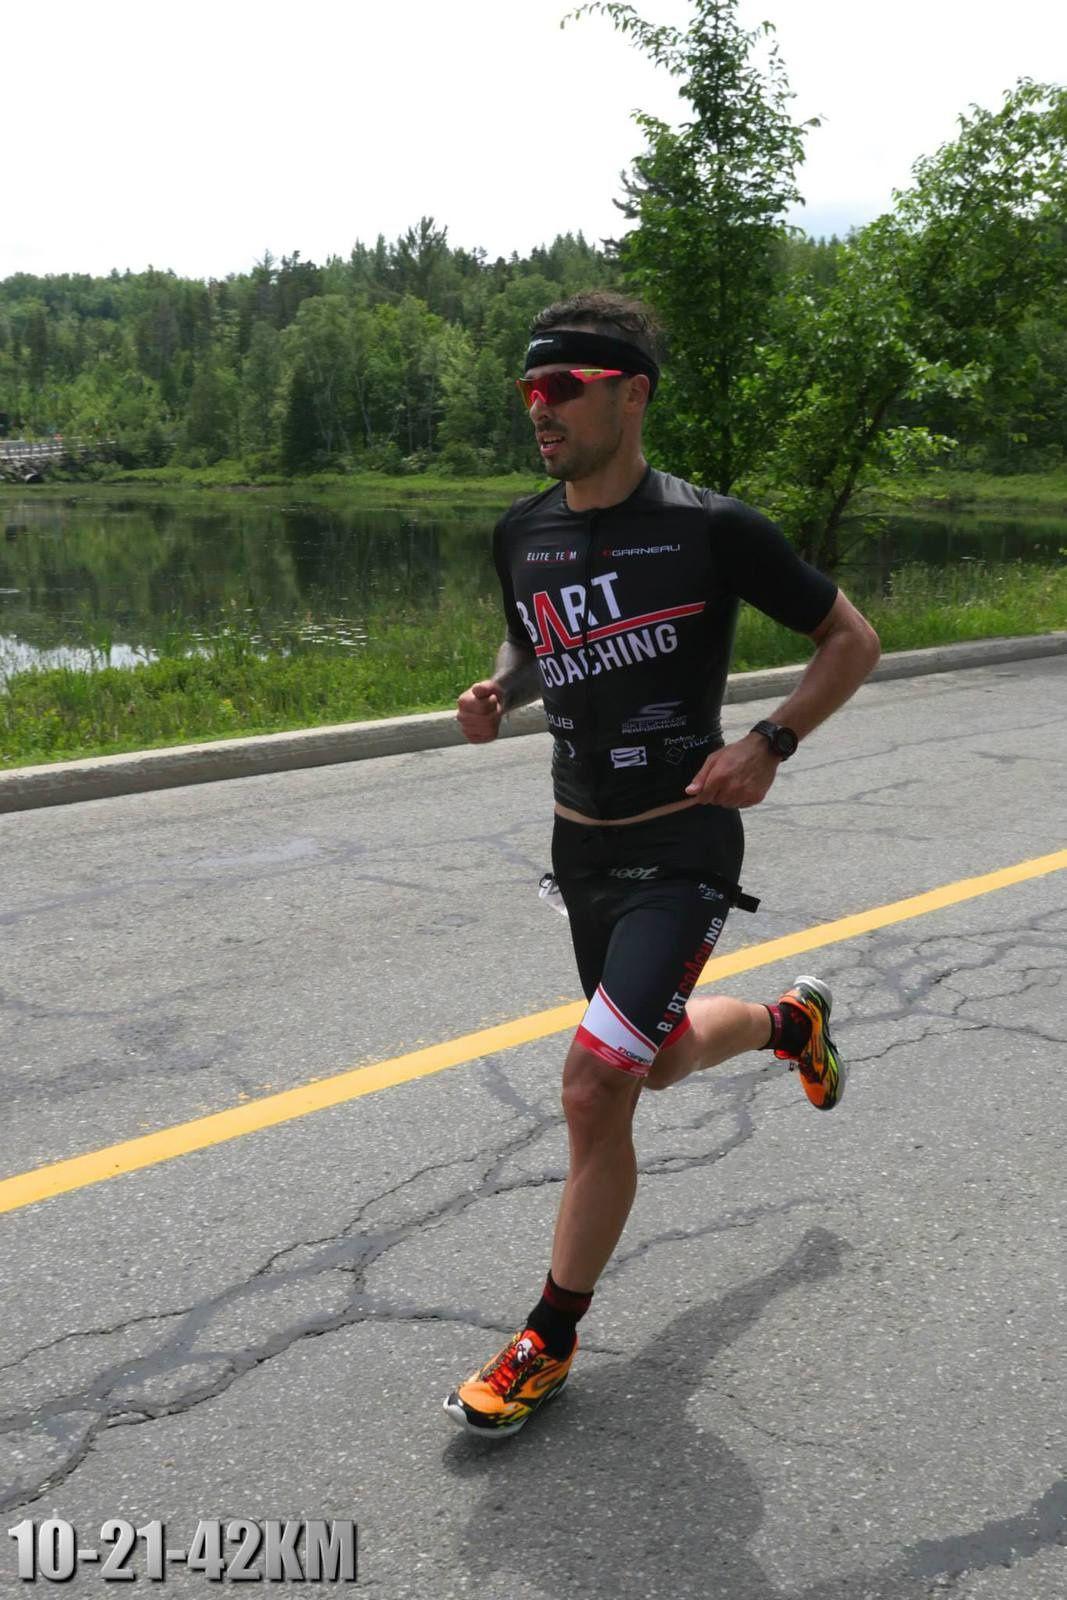 On the run. Crédit: 10-21-42km